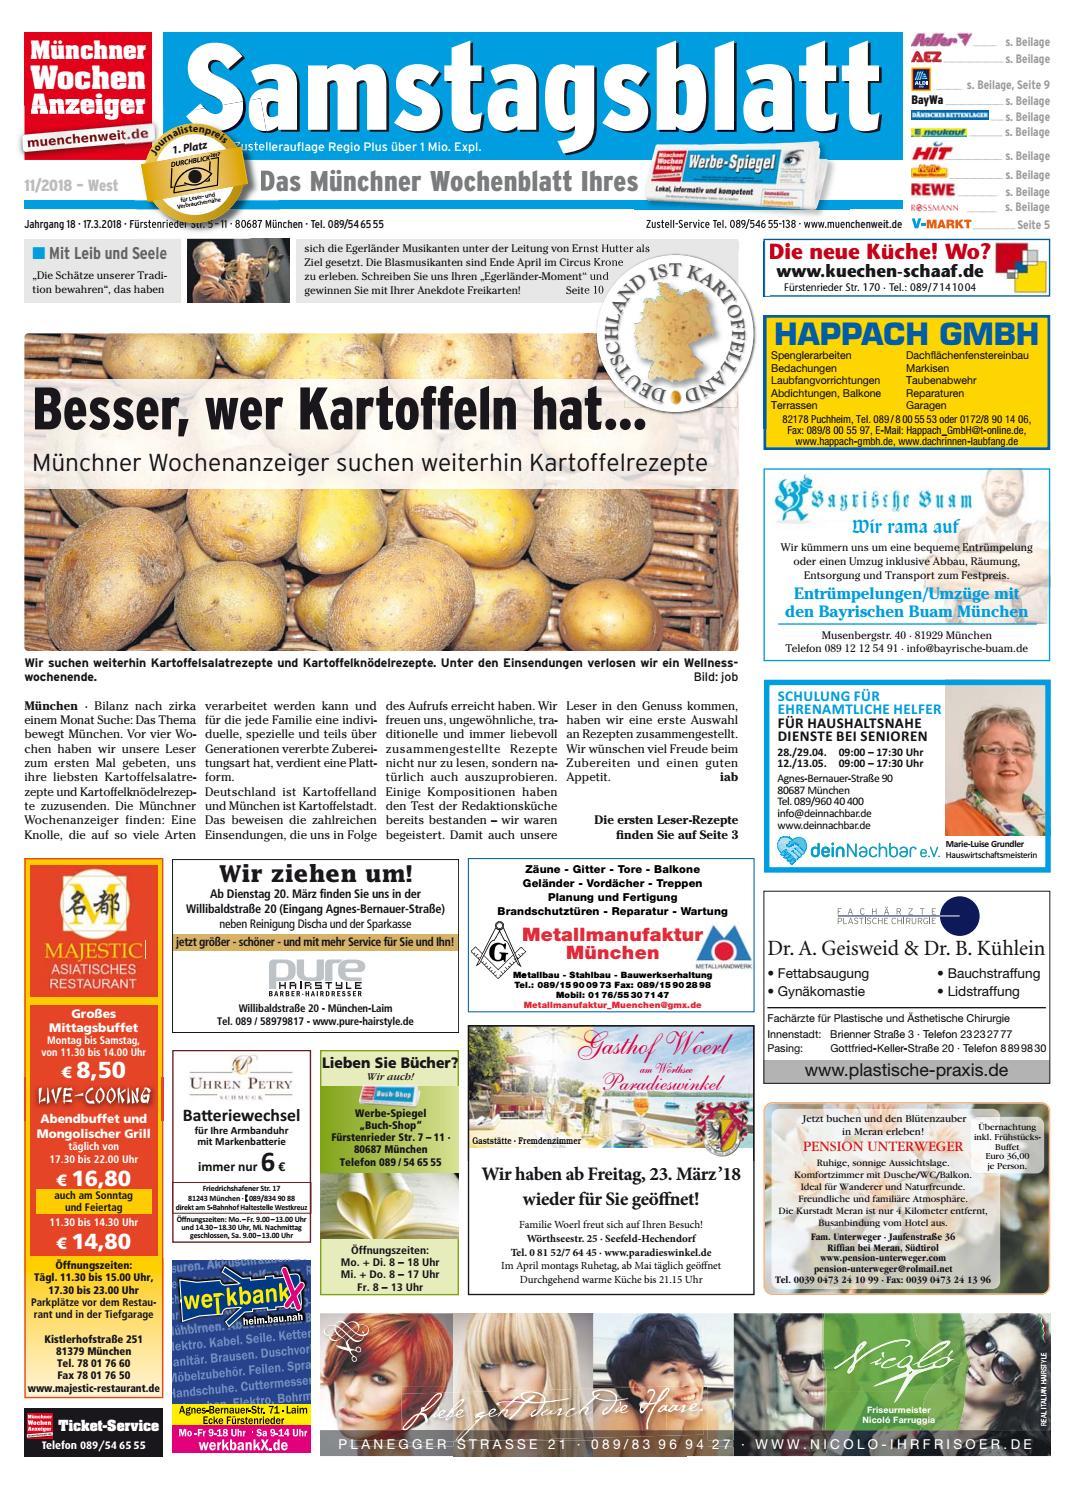 KW 11 2018 by Wochenanzeiger Me n GmbH issuu